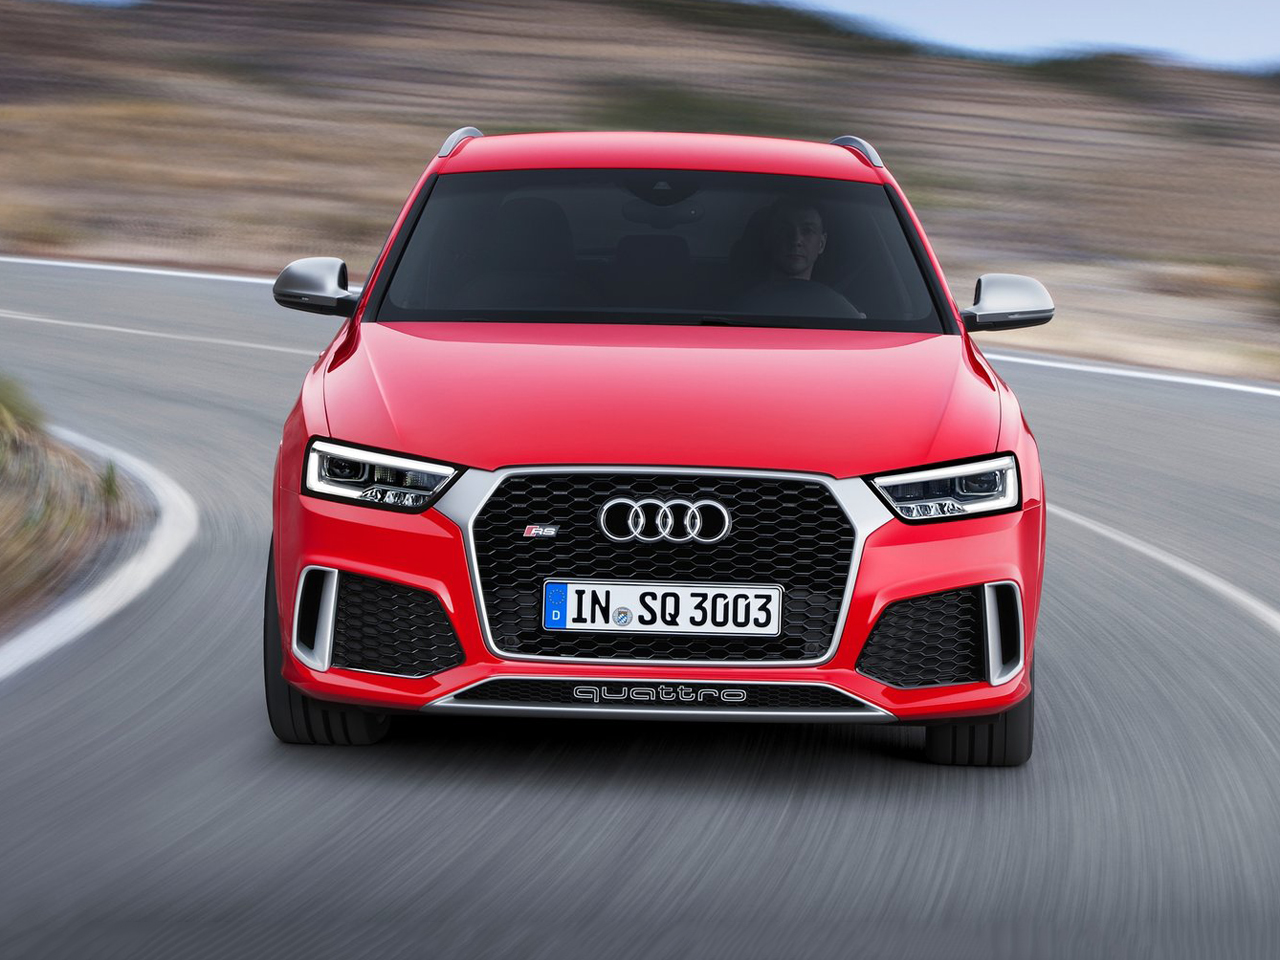 Frontal Audi Q3 RS